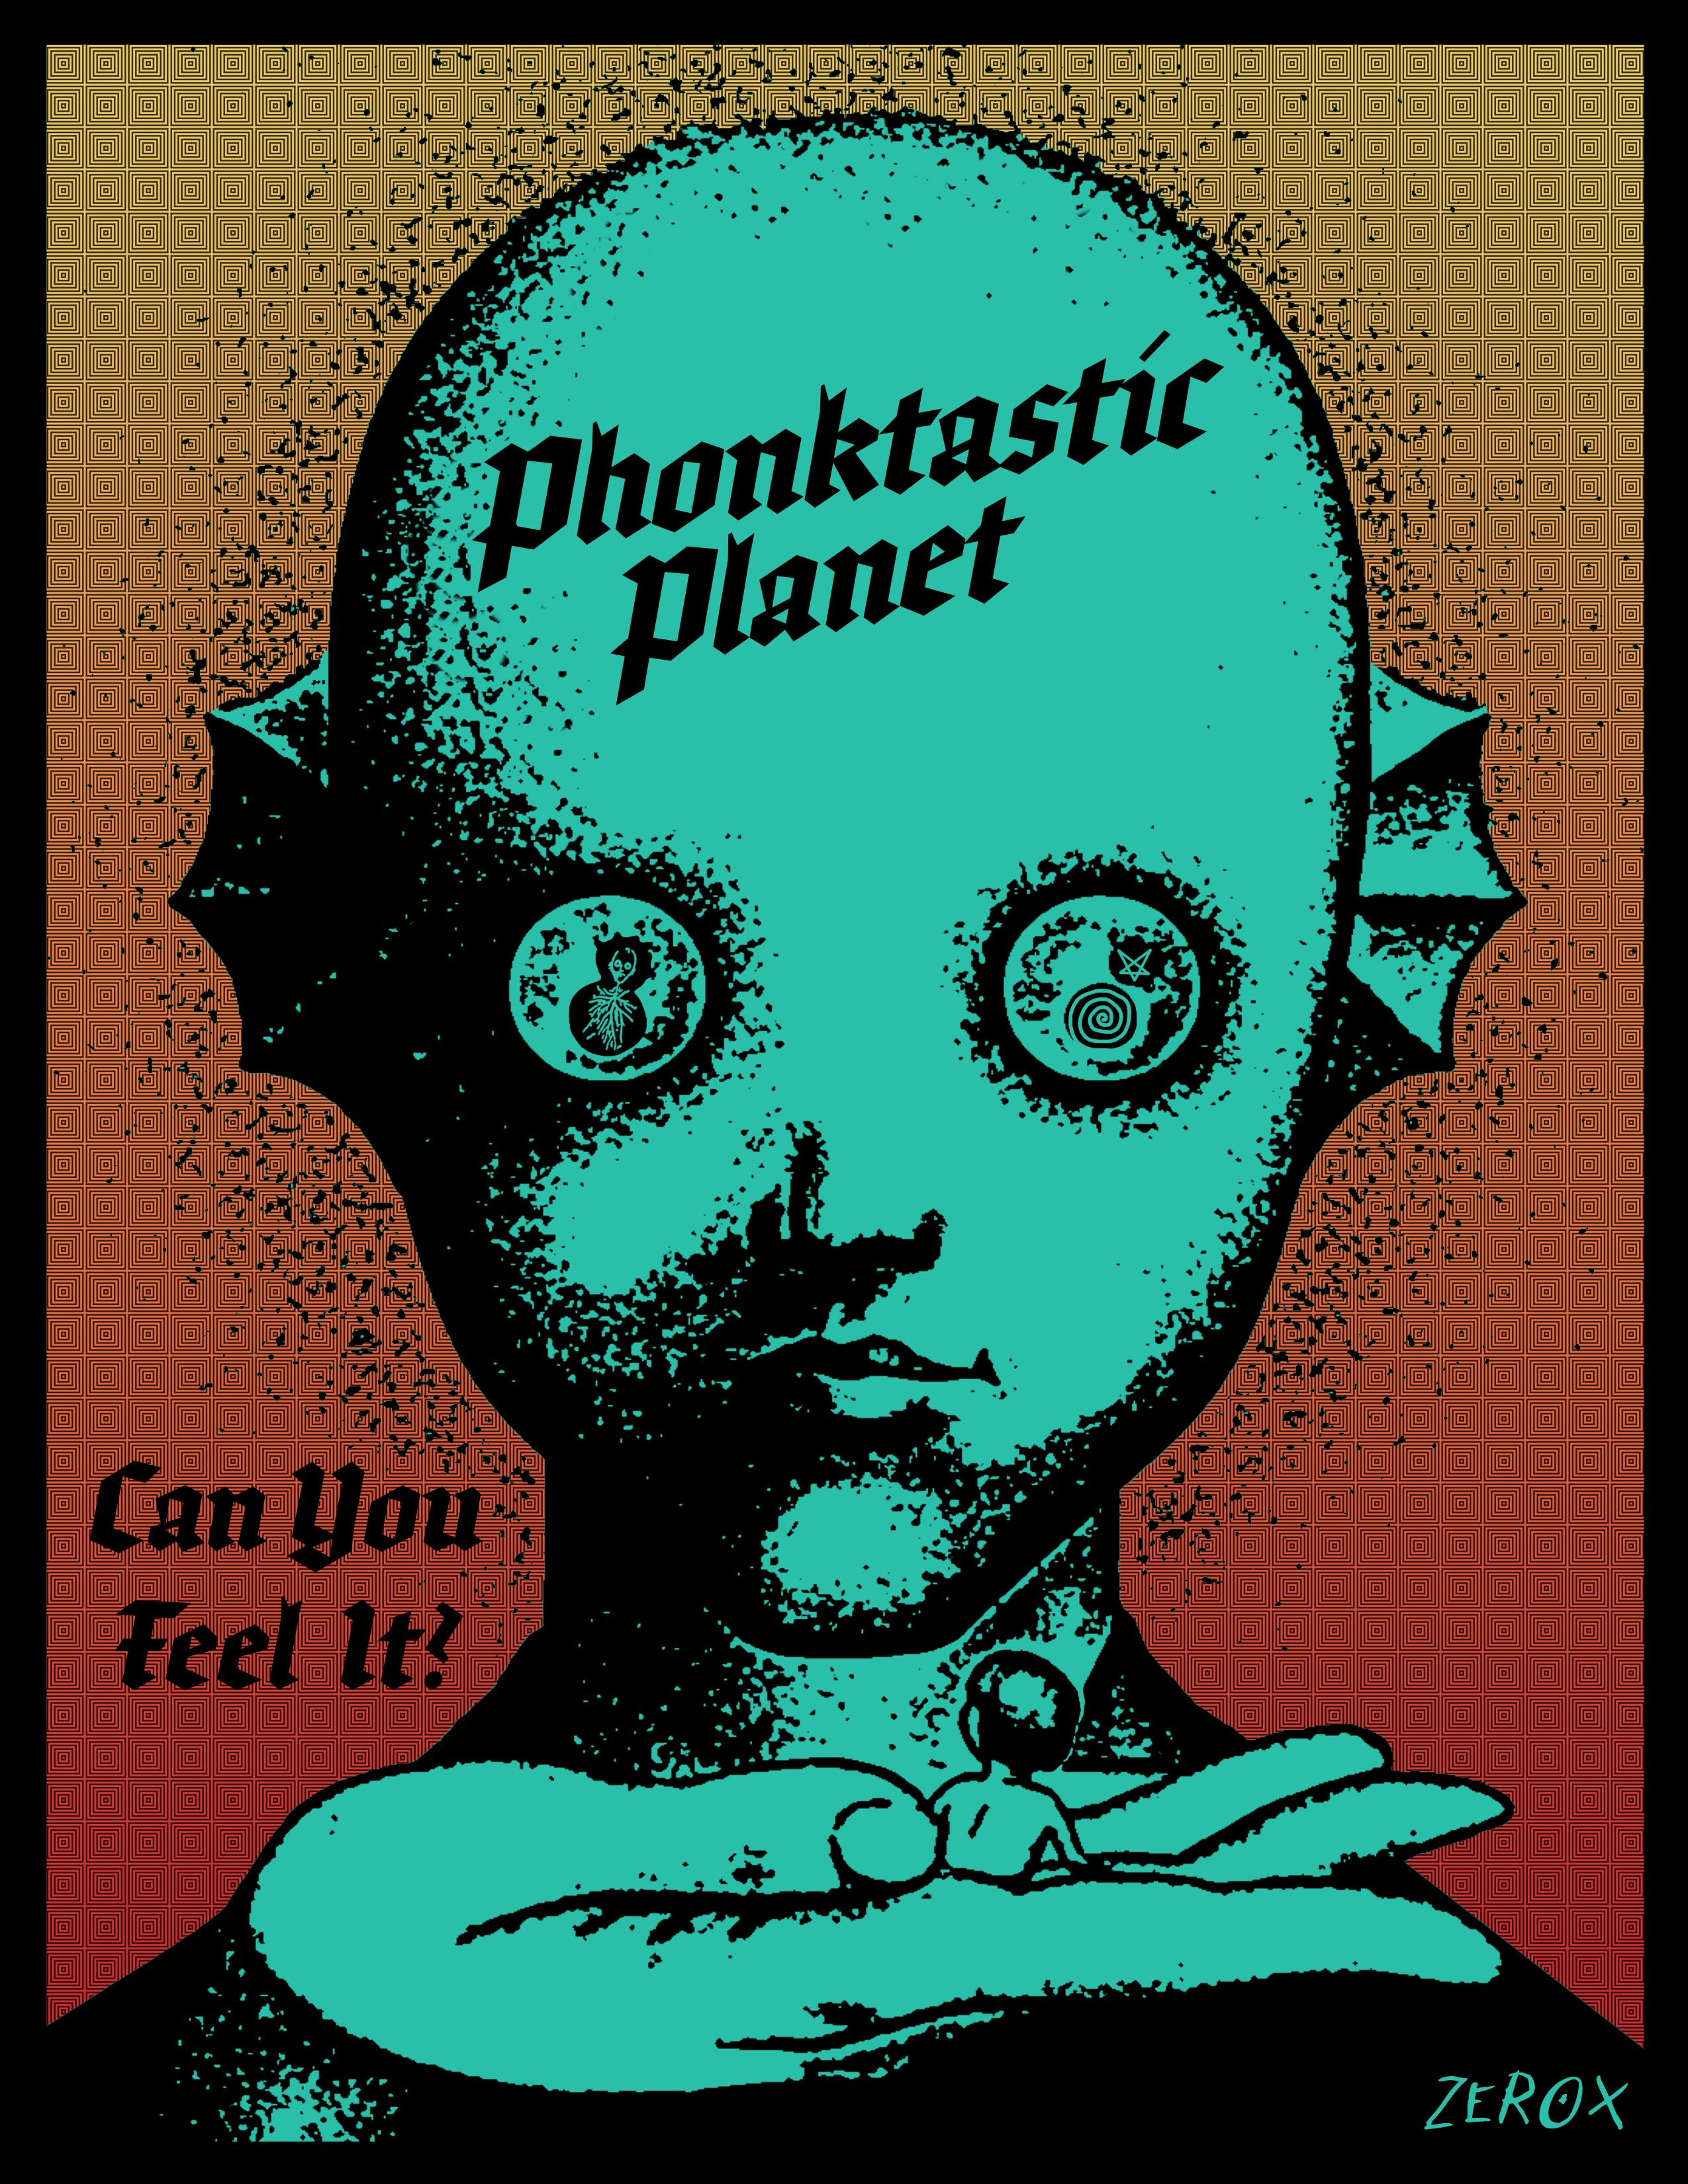 Phonktastic Planet